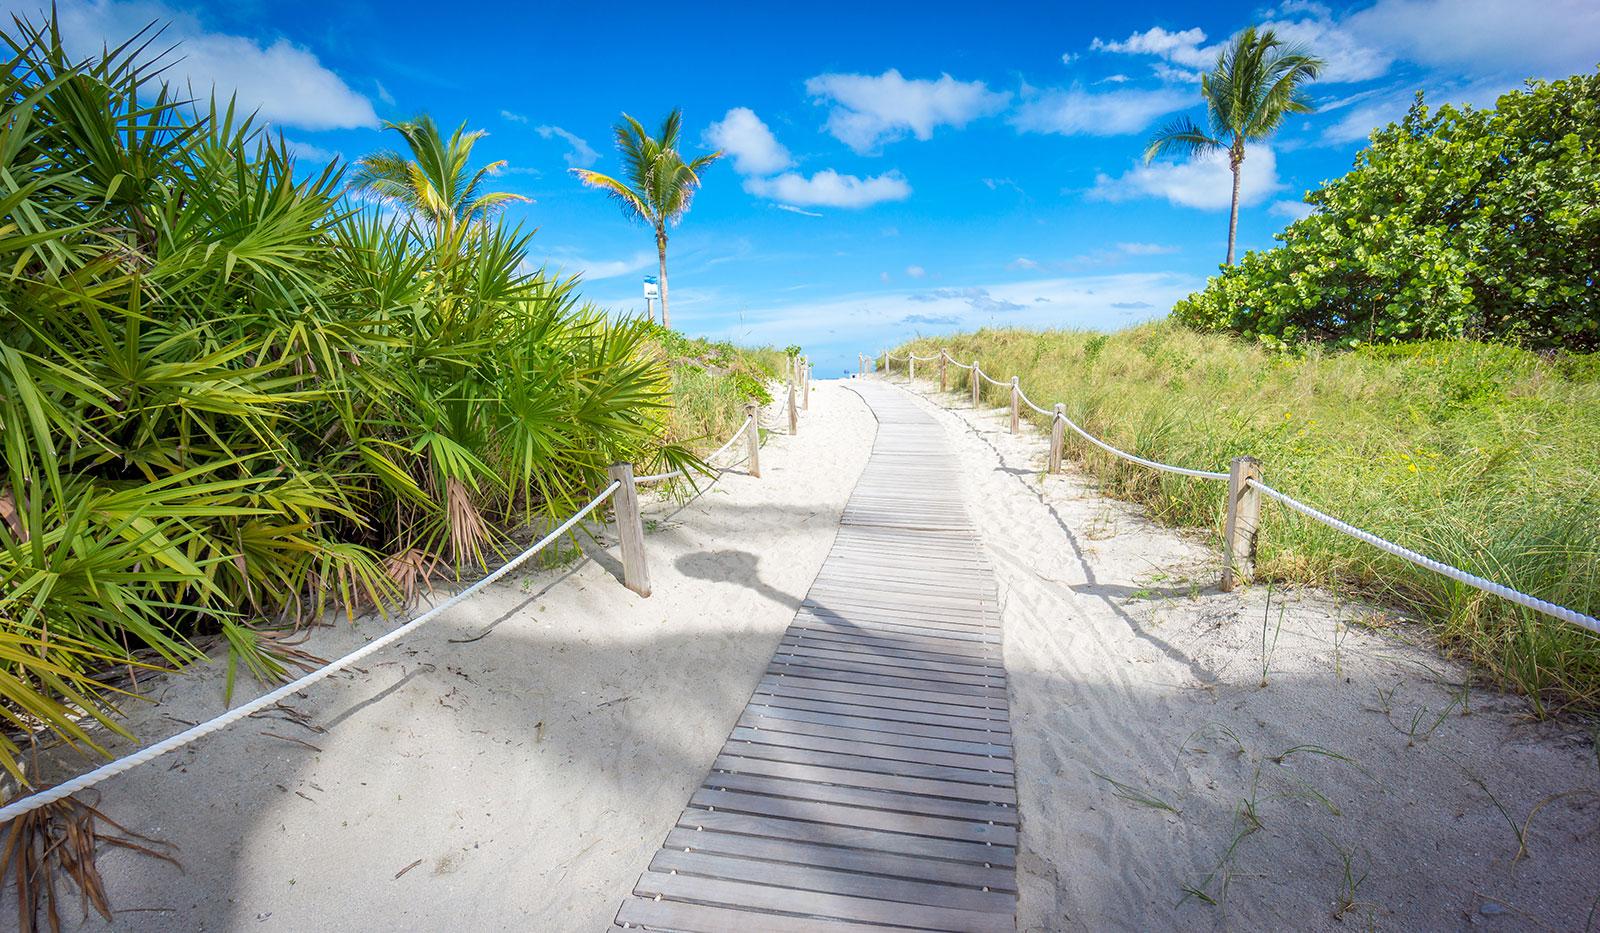 South Beach, la playa mas famosa de Miami